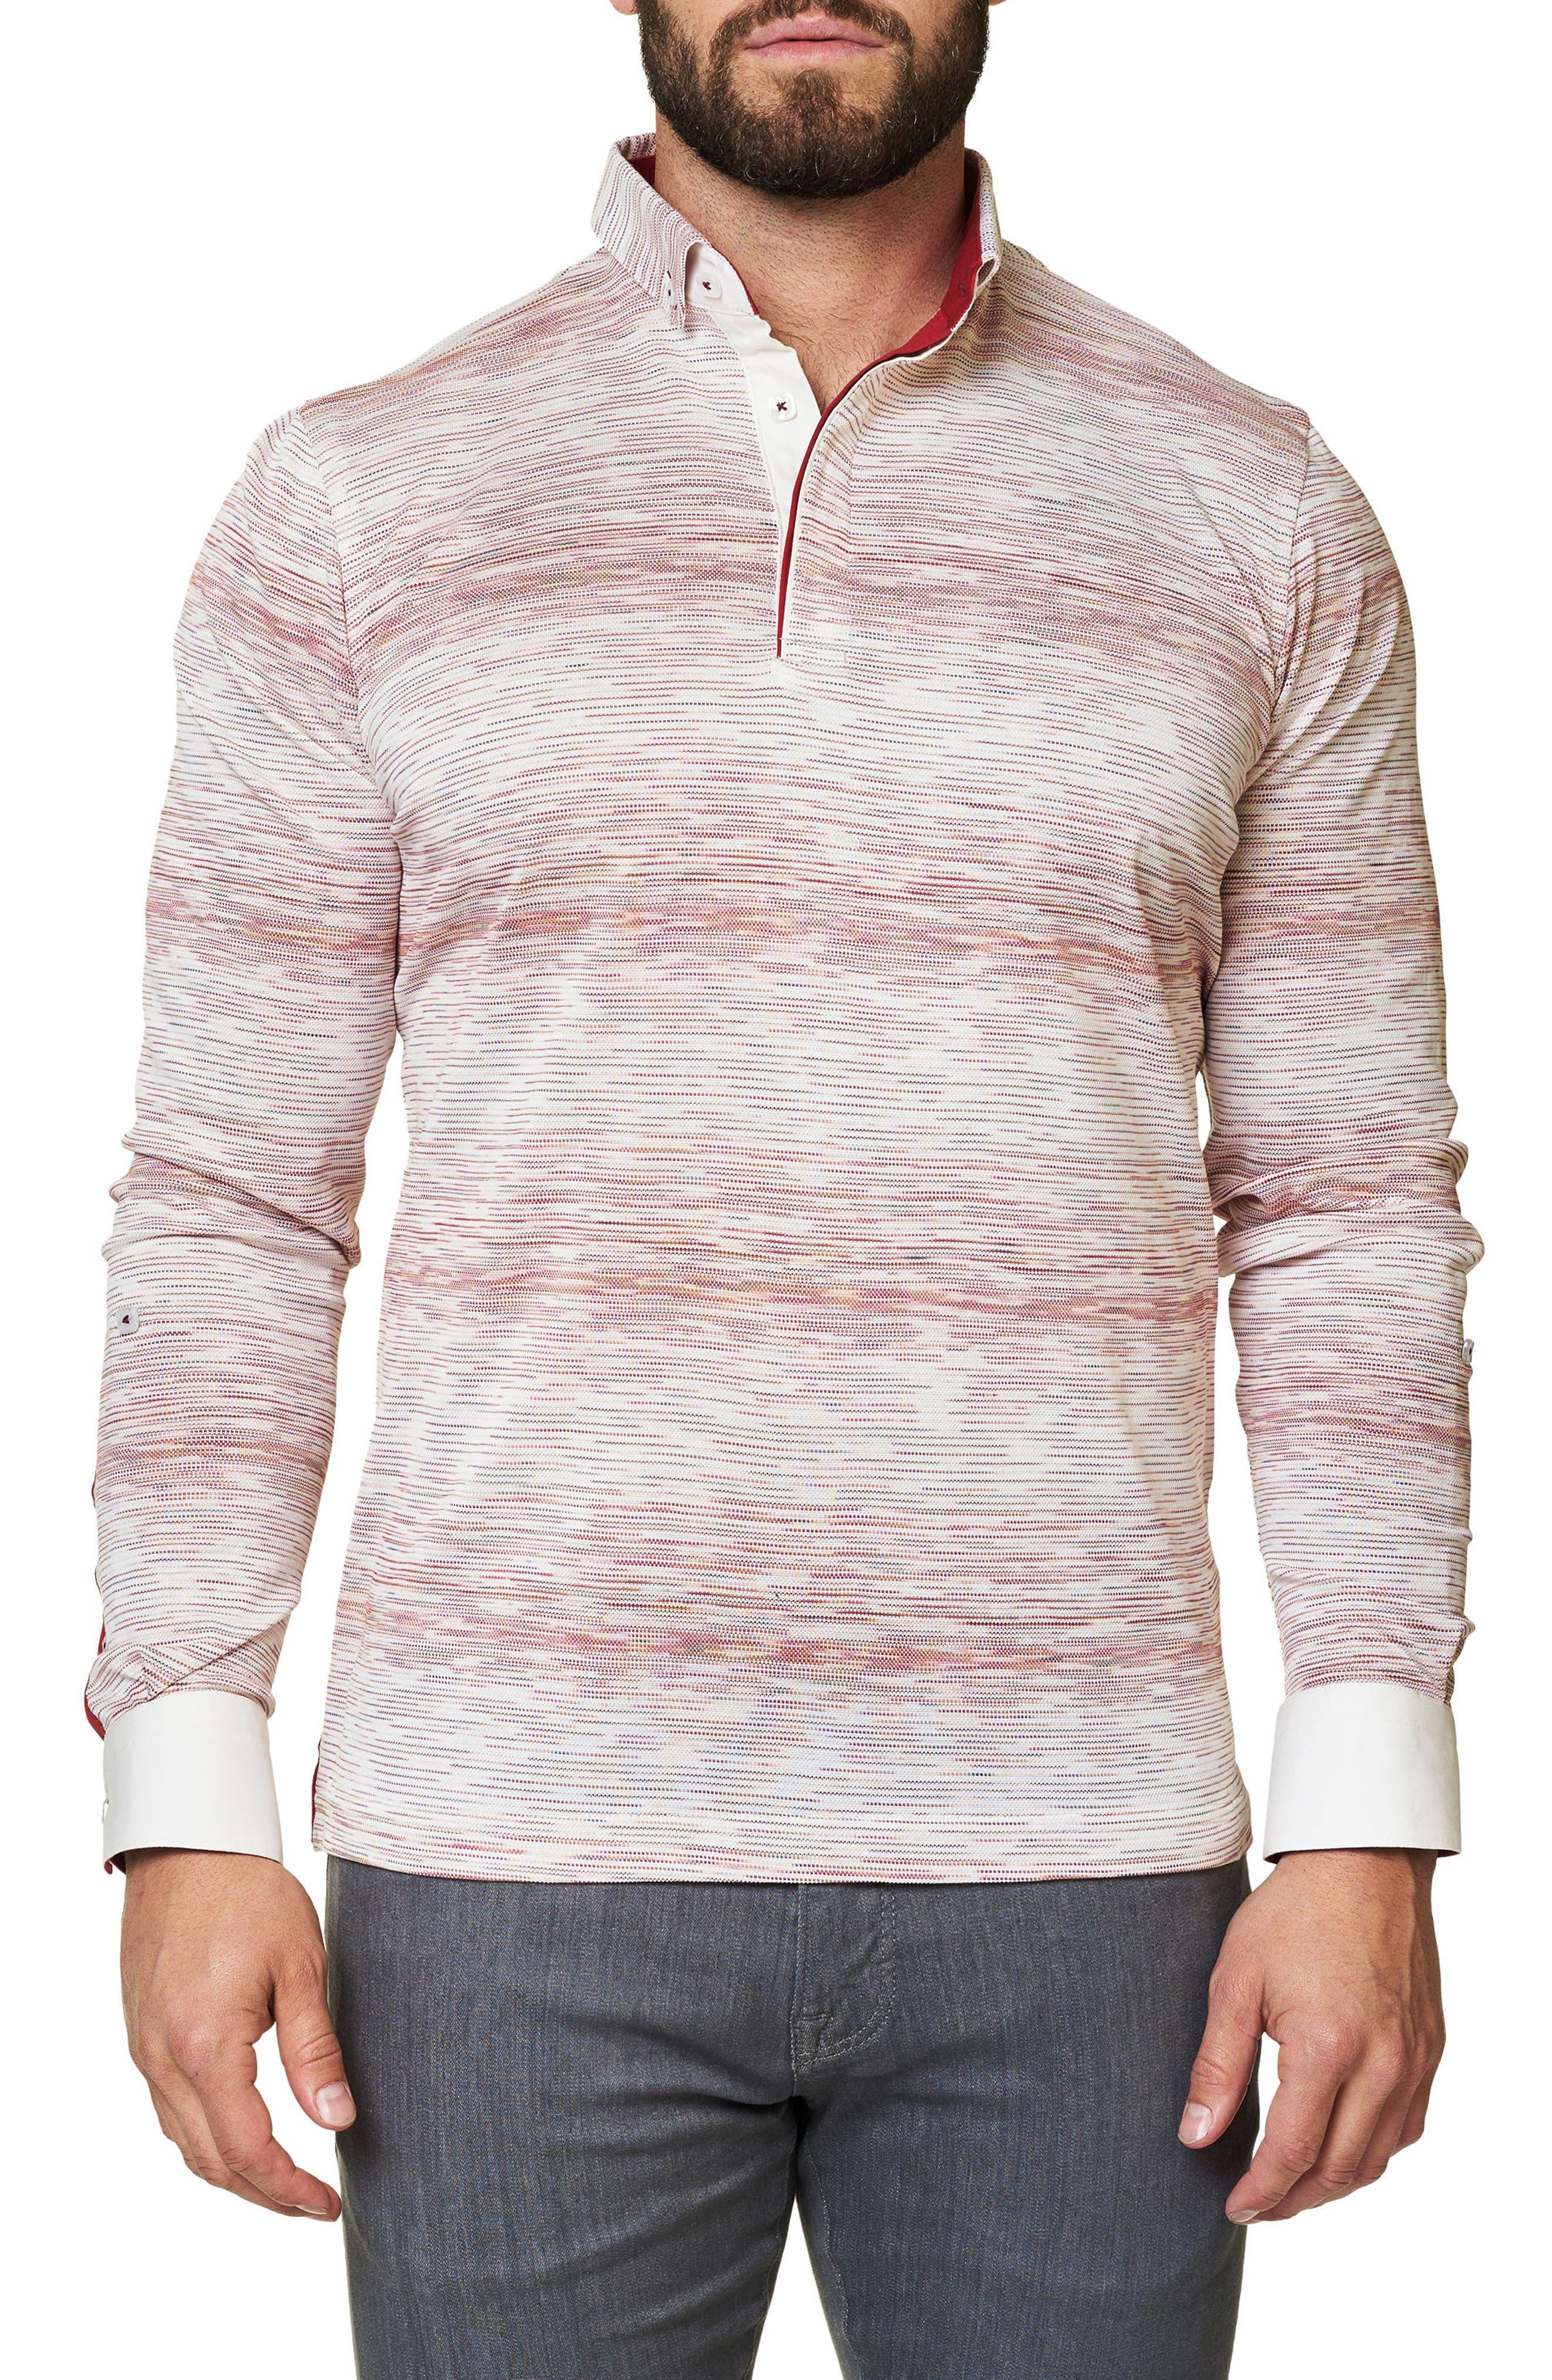 Alternate Image 1 Selected - Maceoo Stripe Long Sleeve Polo